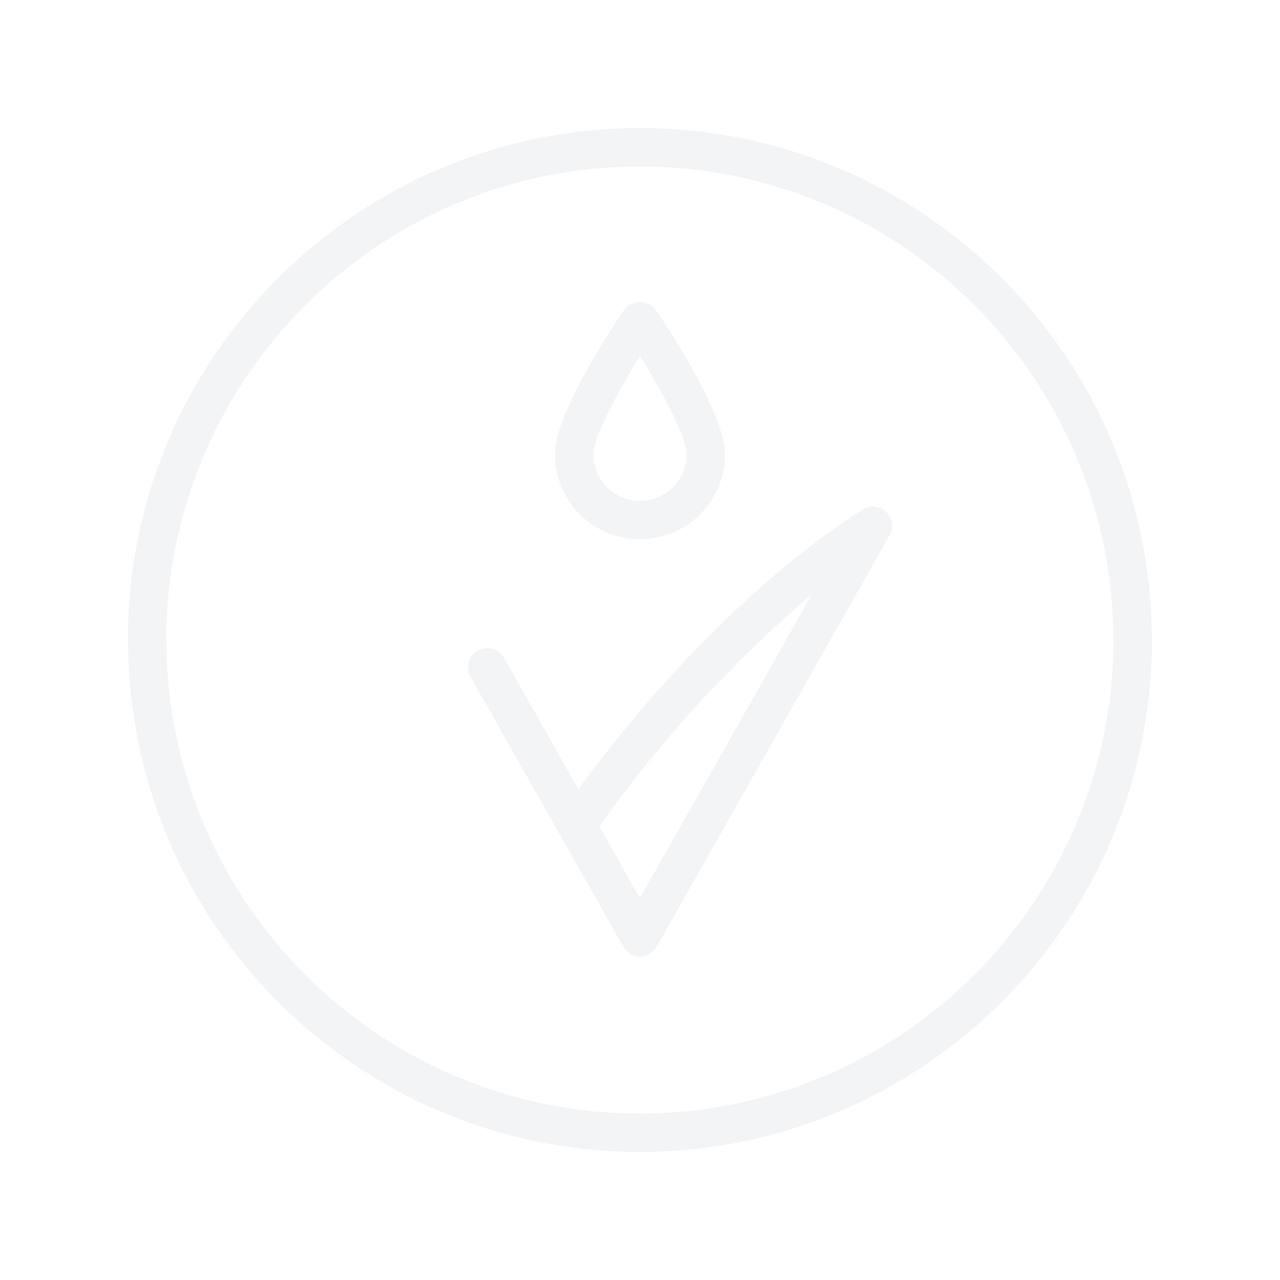 L'OREAL PROFESSIONNEL Blondifier Gloss Shampoo